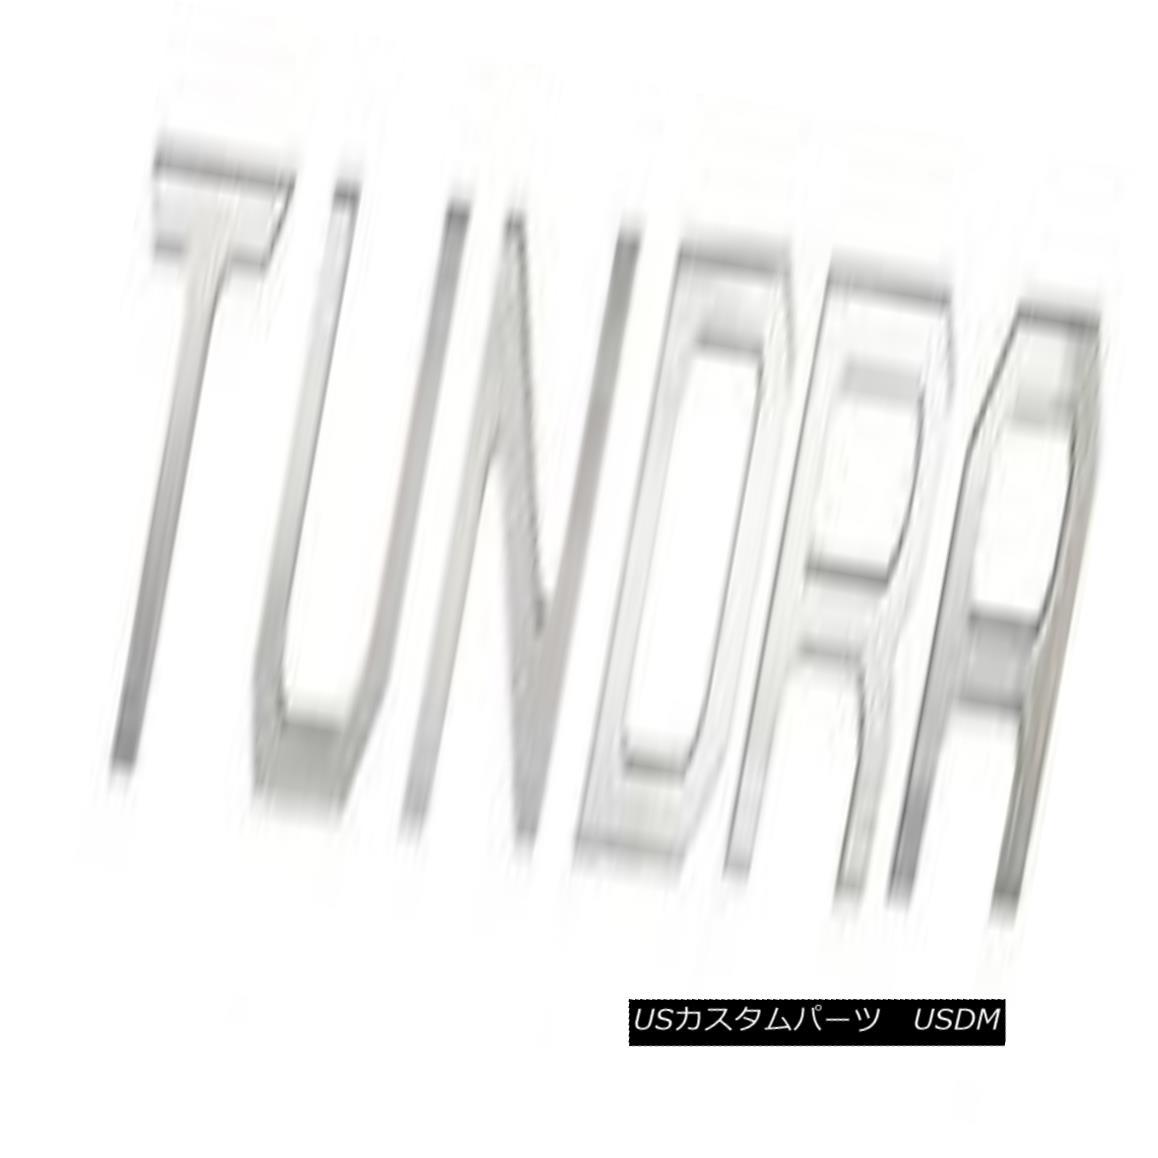 USグリル Fits 2014-15 Toyota Tundra Accent Letters T-U-N-D-R-A CCITUNDRA01S 2014-15 Toyota Tundraアクセント記号T-U-N-D-R-A CCITUNDRA01S